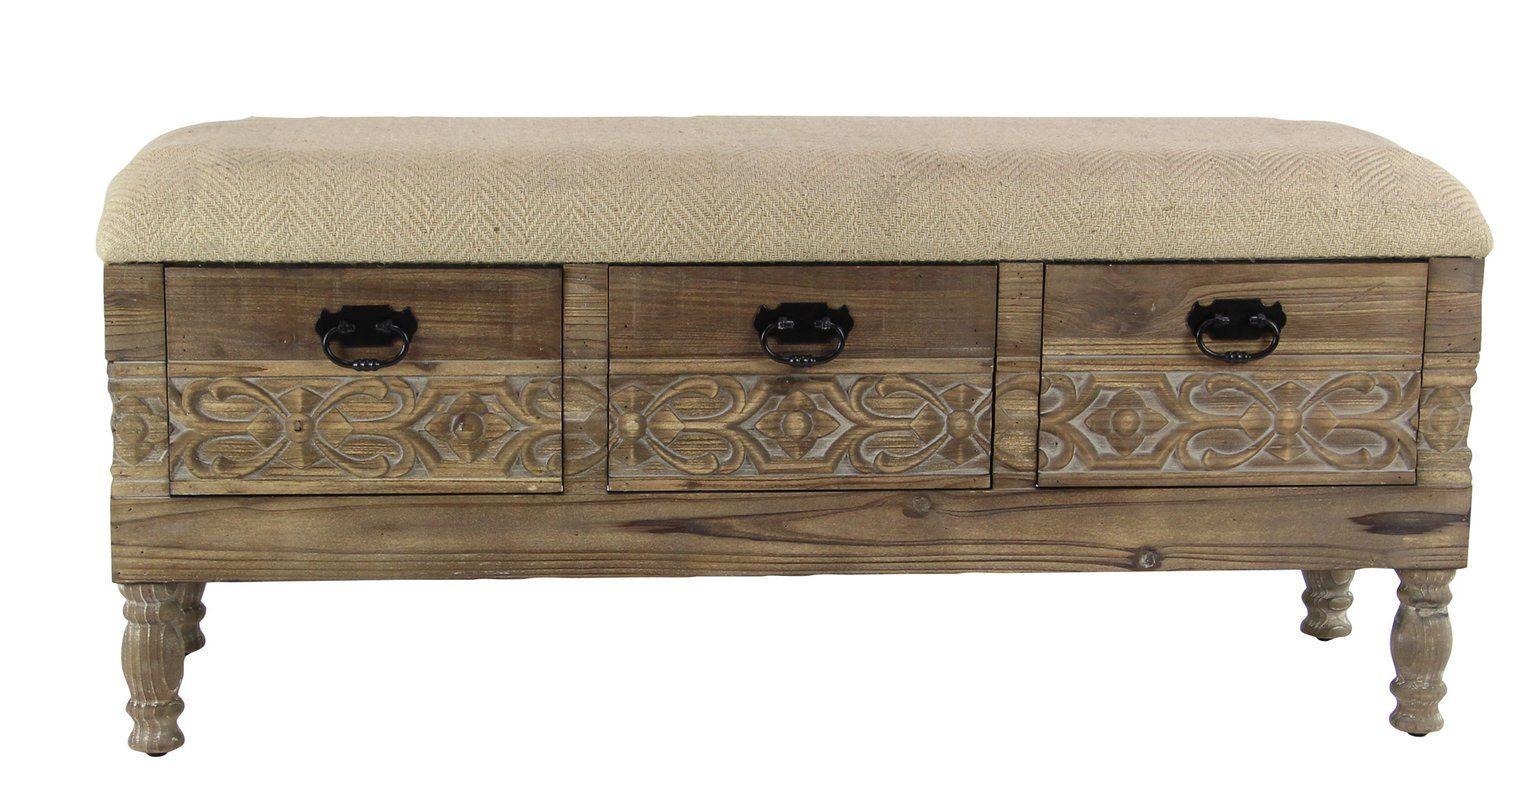 Gorgias Rustic Solid Wood 3 Drawer Storage Bench 3 Drawer Storage Storage Drawers Storage Bench